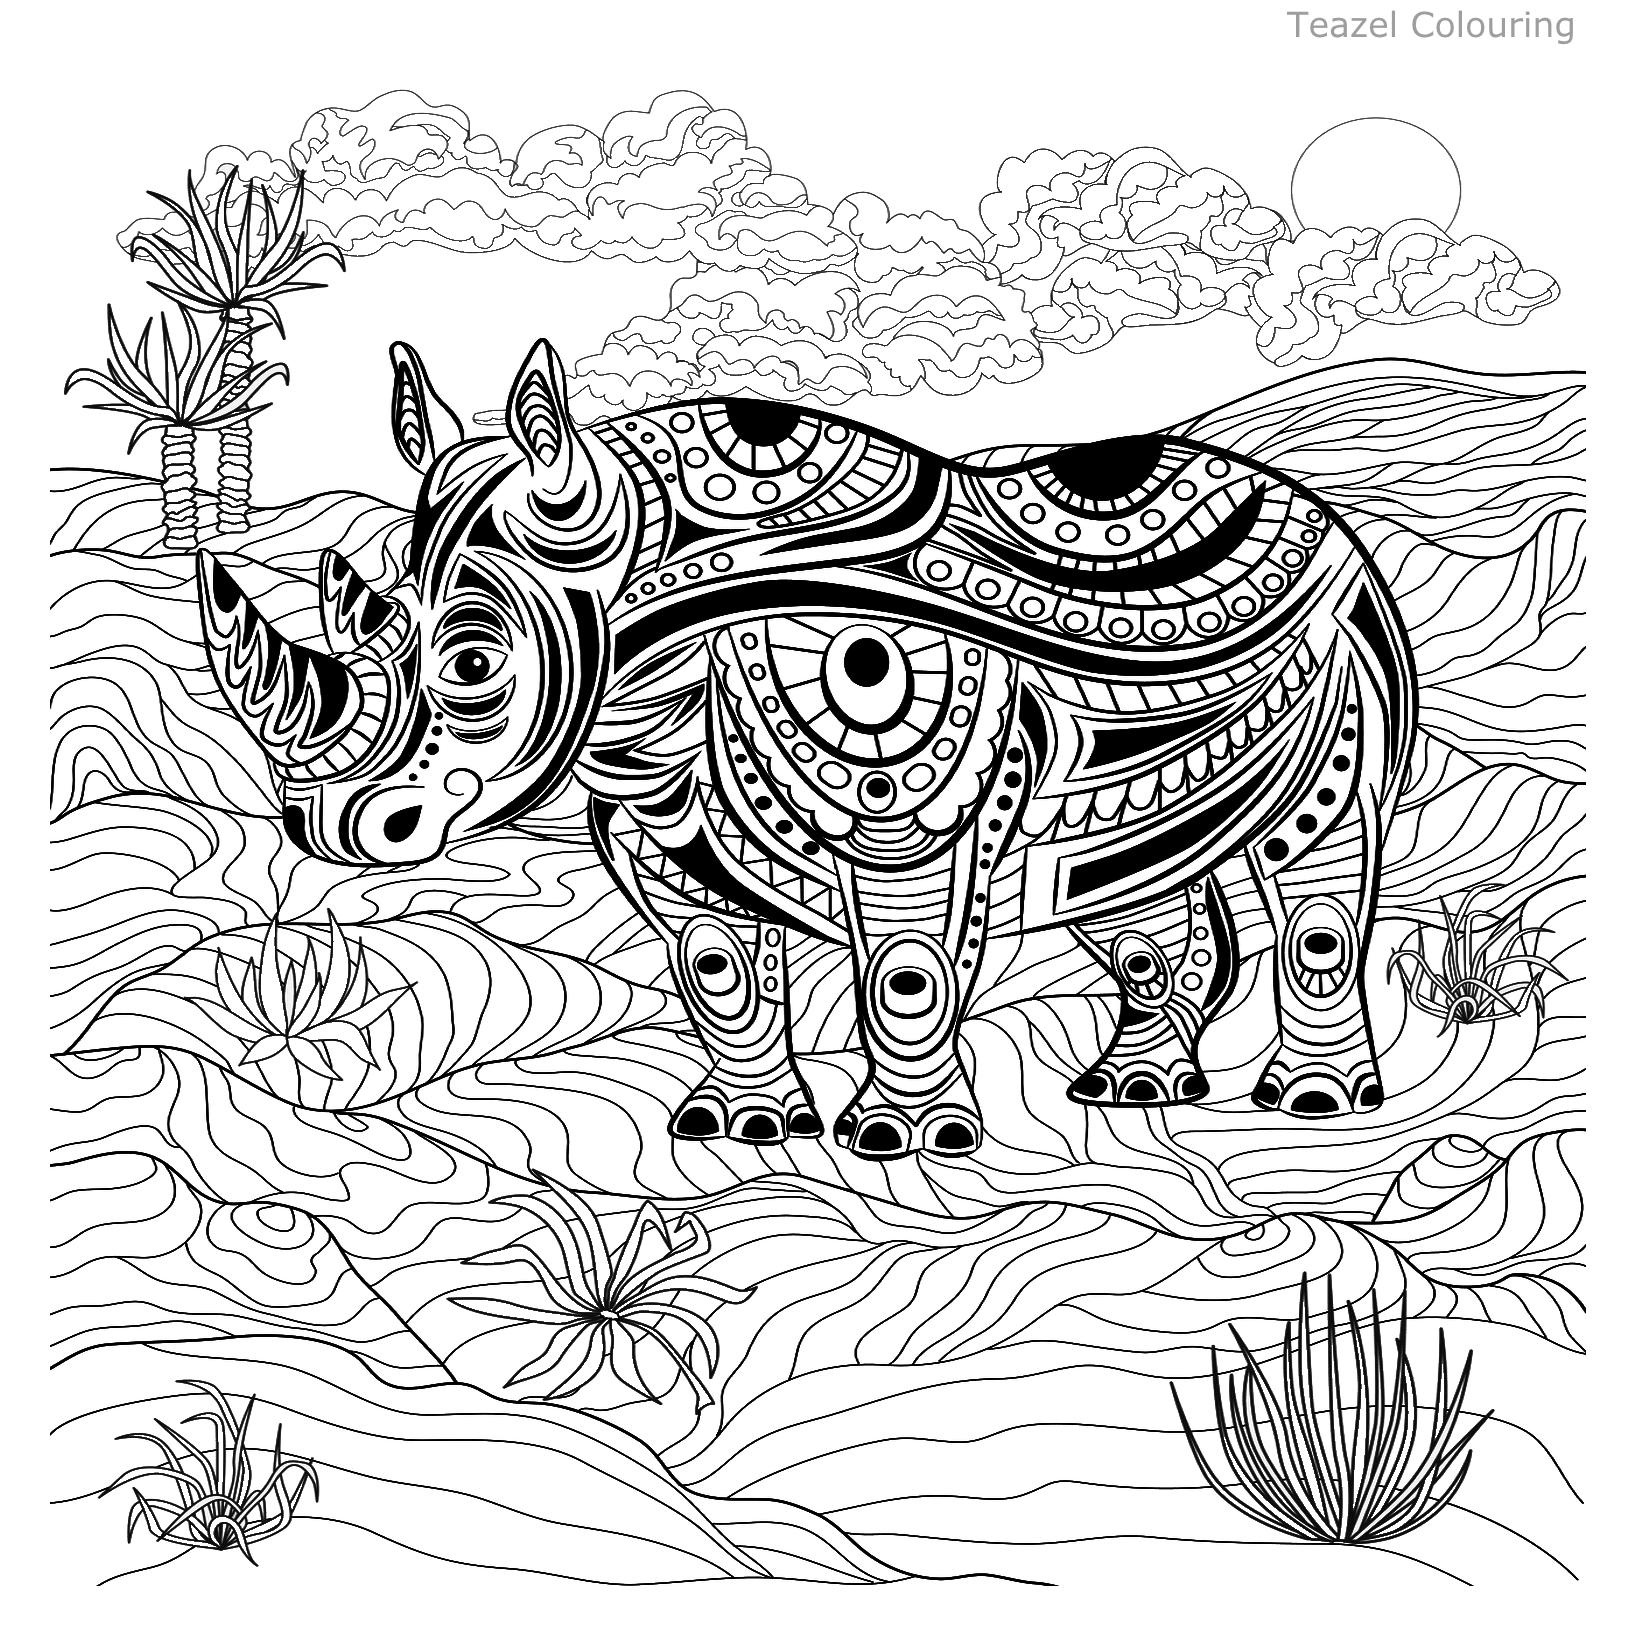 Pin By Barbara On Save The Rhinos Animal Coloring Pages Horse Coloring Pages Coloring Pages [ 1636 x 1636 Pixel ]